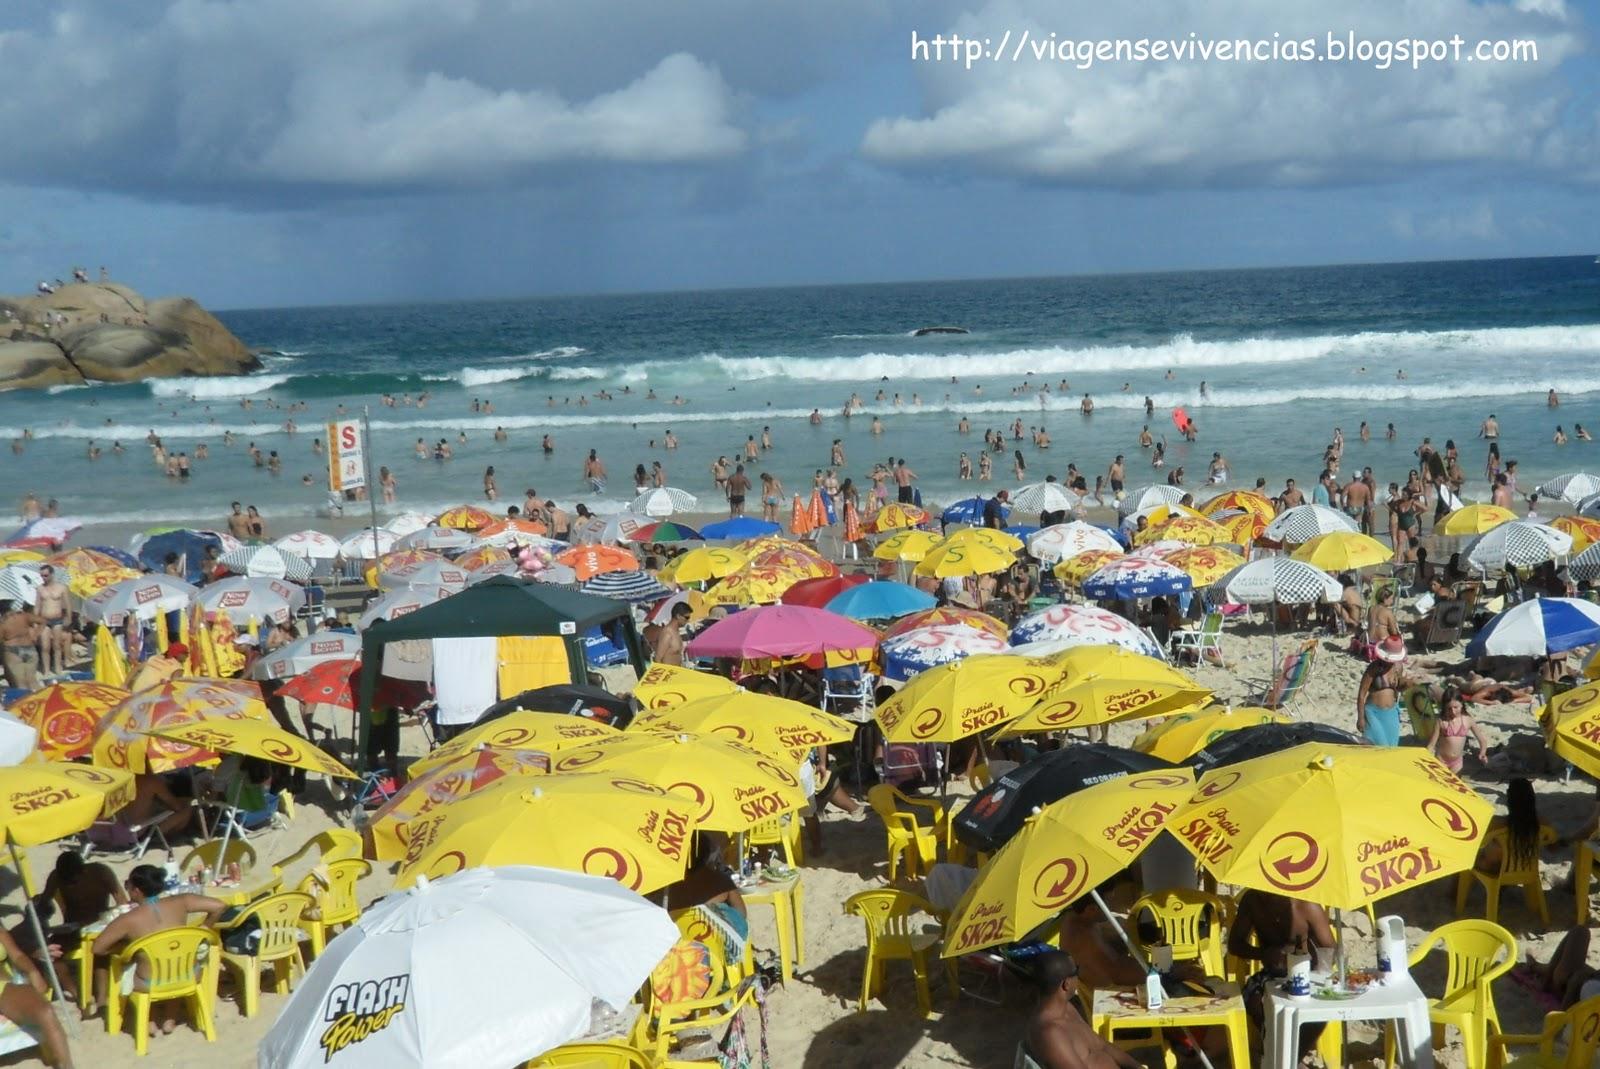 Praia jerere internacional - 3 part 9